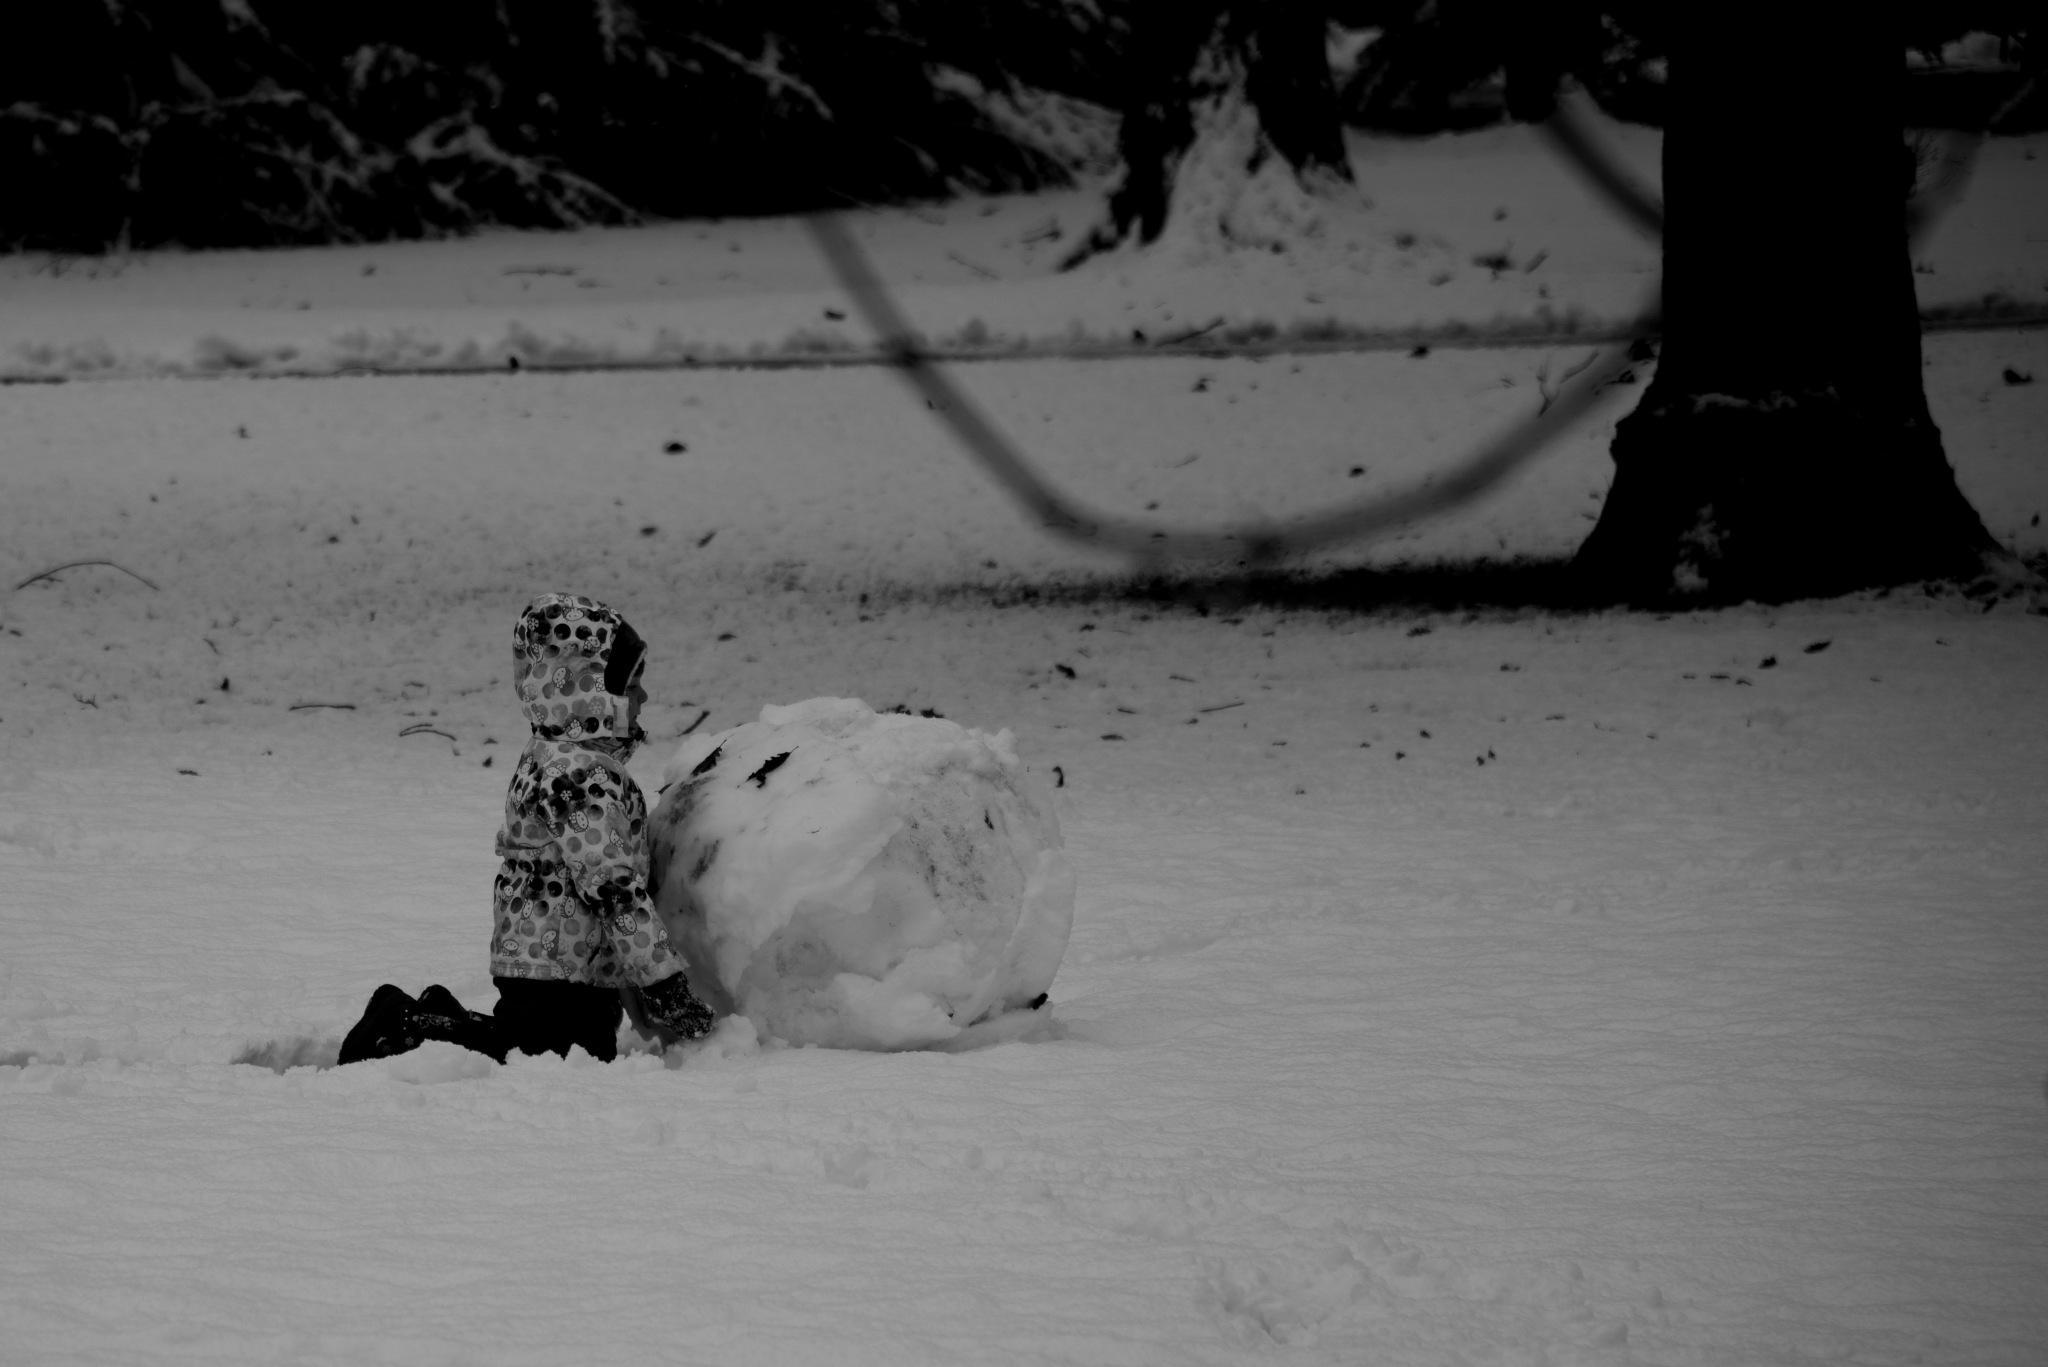 snow man by dusanvladimir